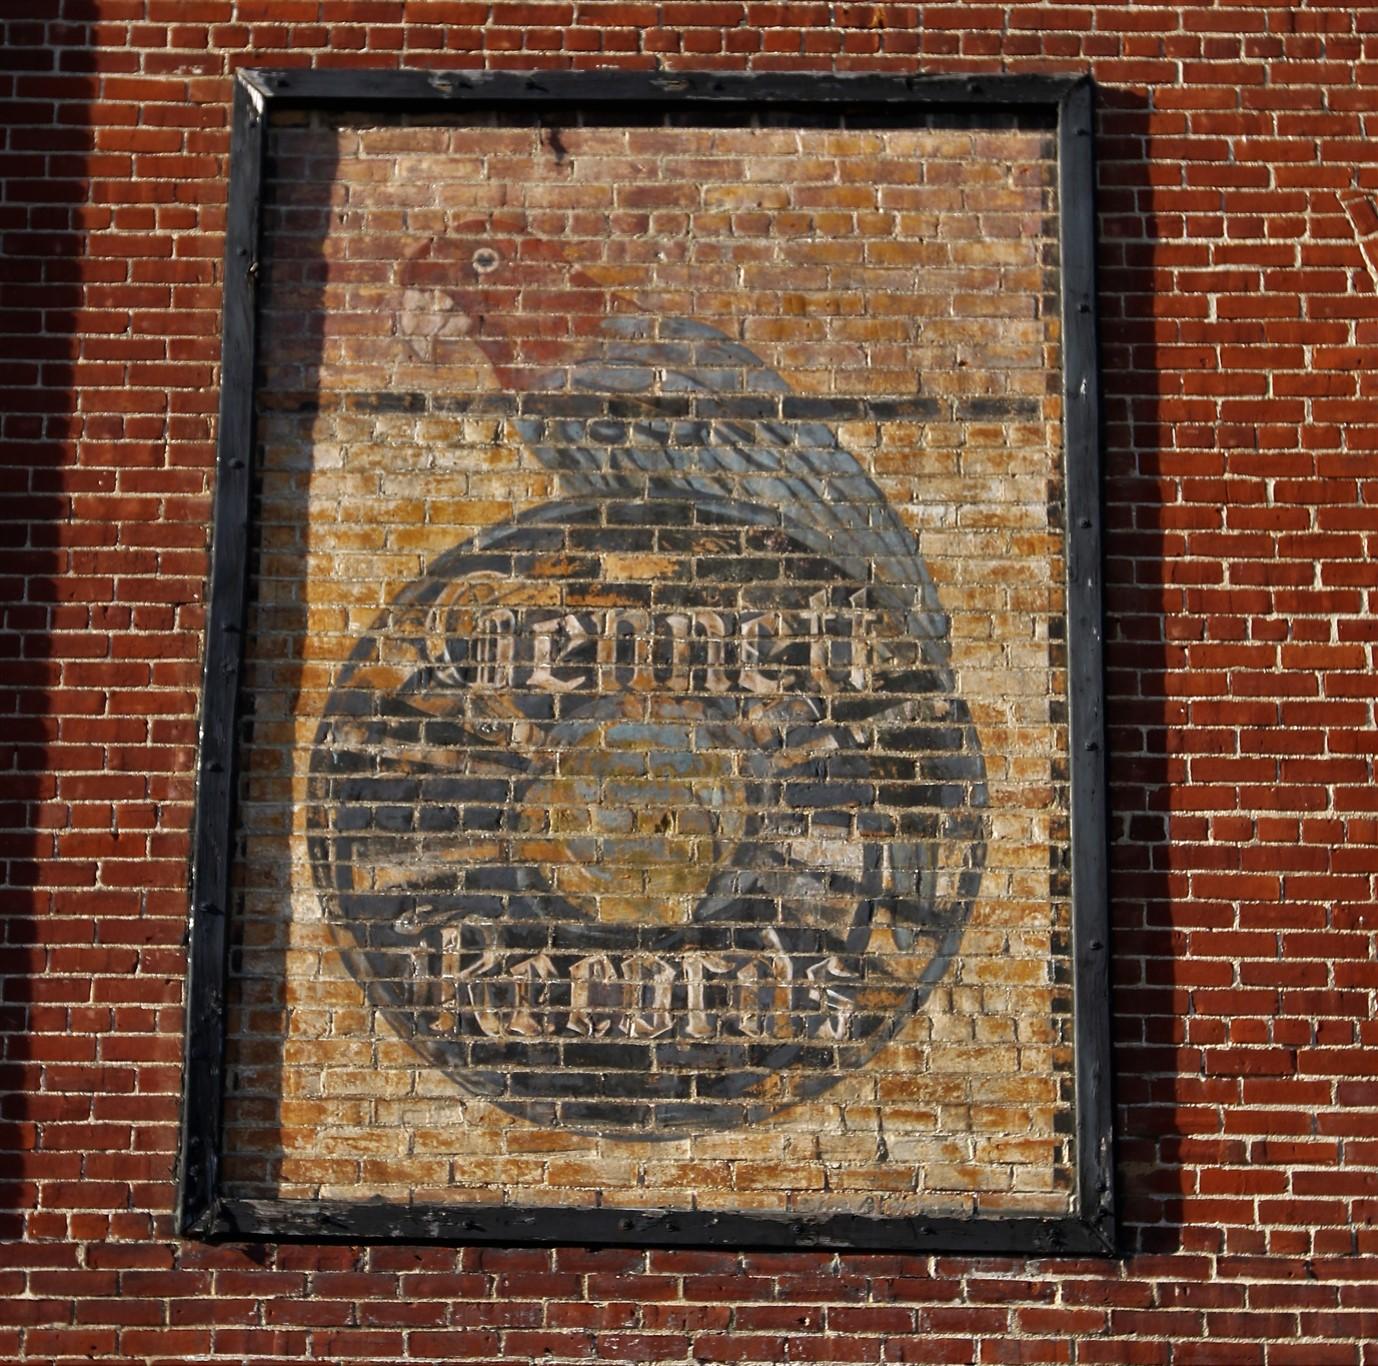 2018 07 17 478  Richmond IN Gennett Records Walk of Fame.jpg